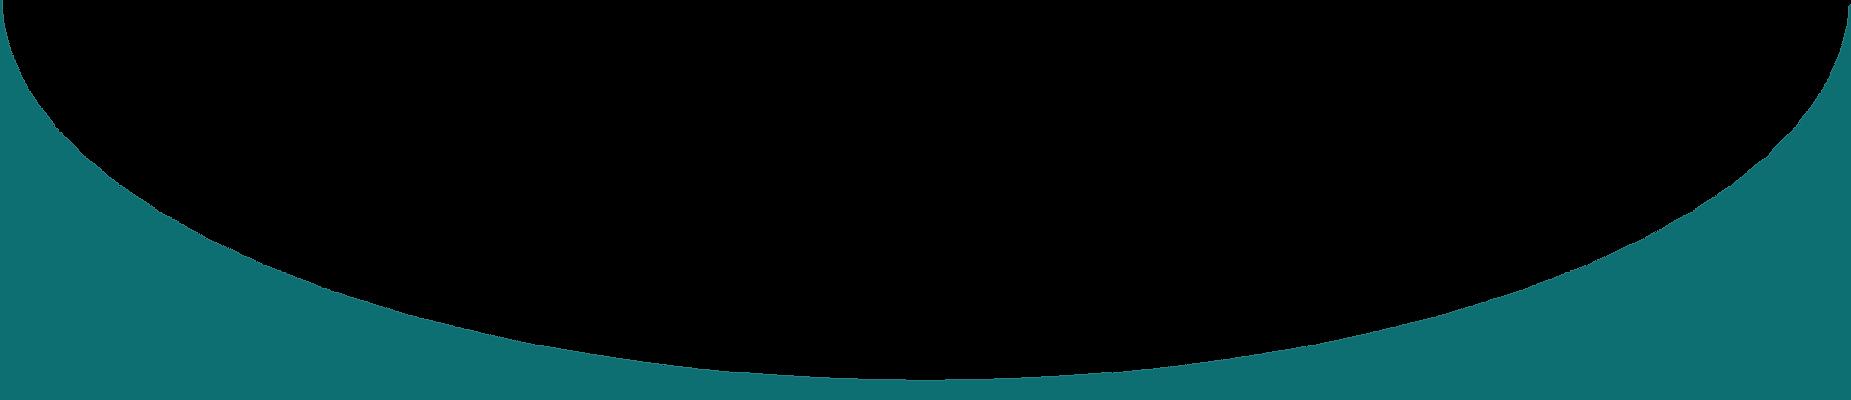 Homw-Page-Blue-Semi-Circle.png